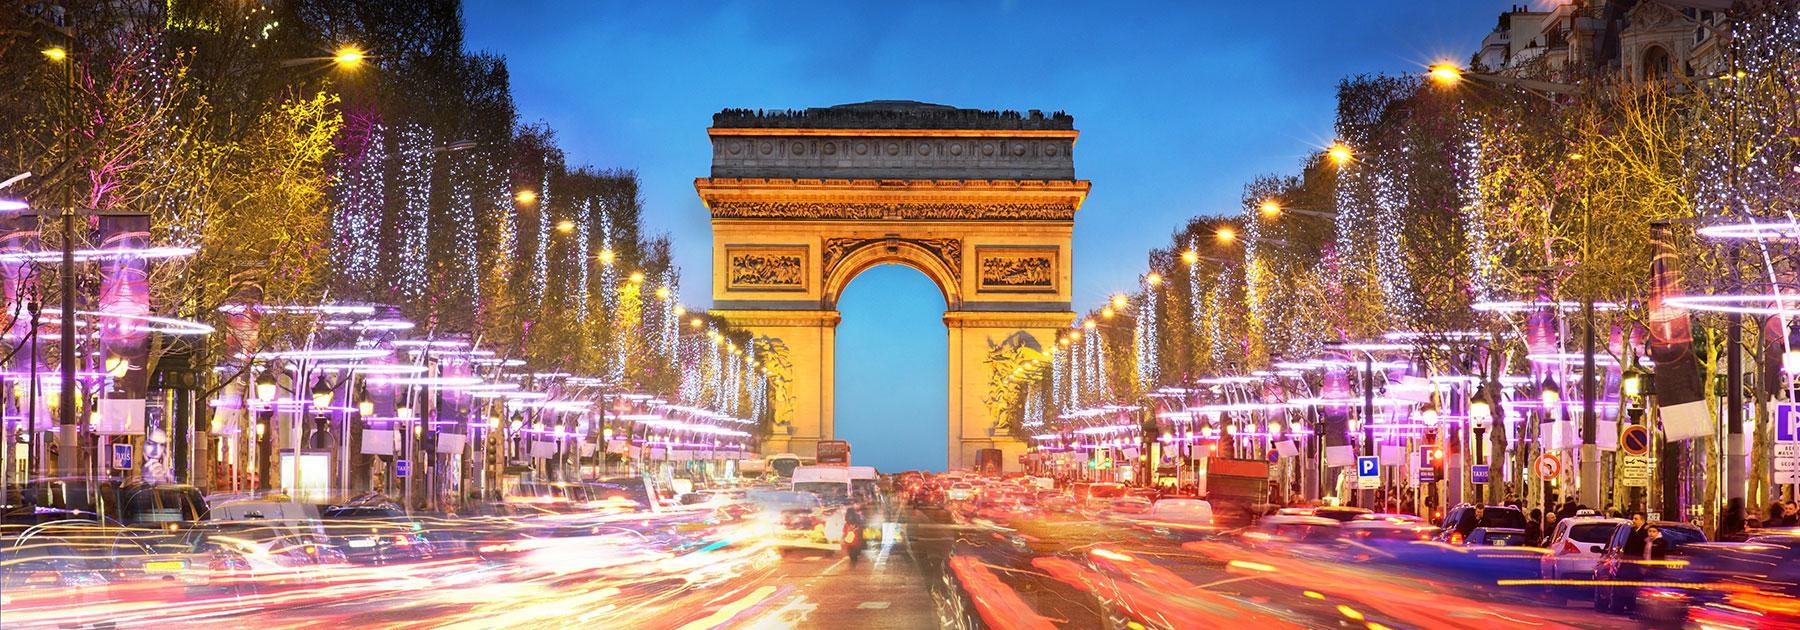 France Travel Deals Travel To France France Travel Guide